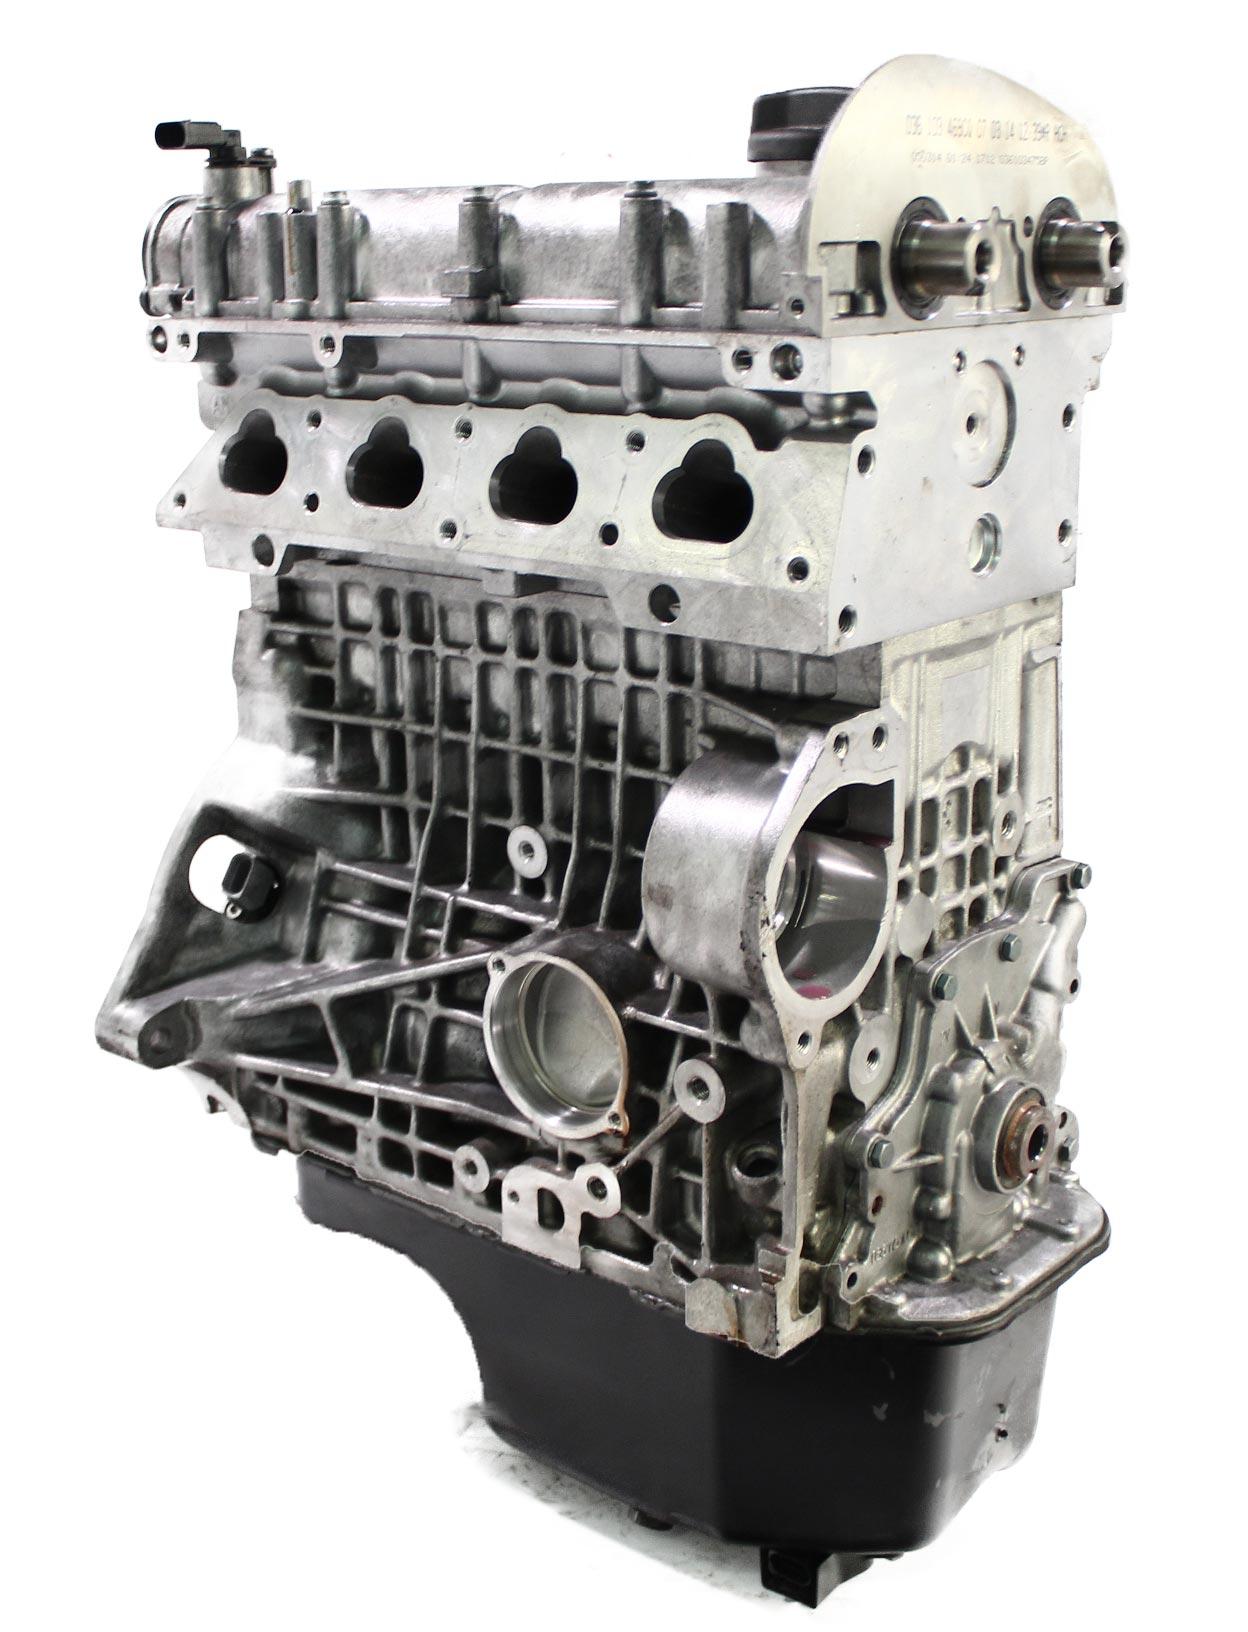 Motor Seat Skoda VW V ST Leon 1P Fabia Polo 6R 1,4 Benzin CGG CGGB